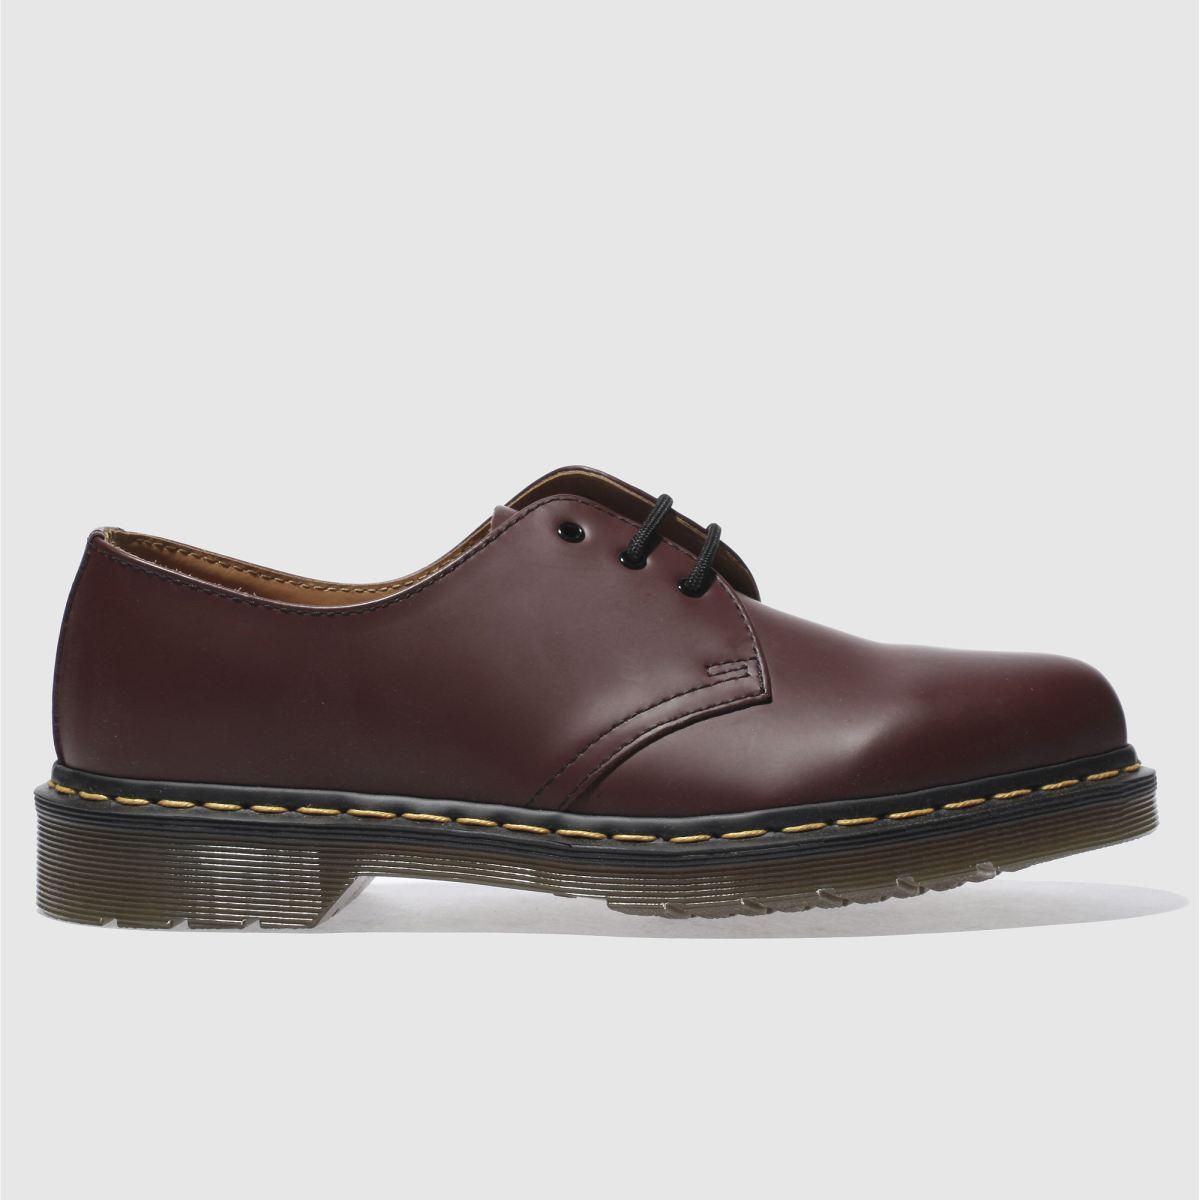 Dr Martens Burgundy 1461 Shoe Shoes